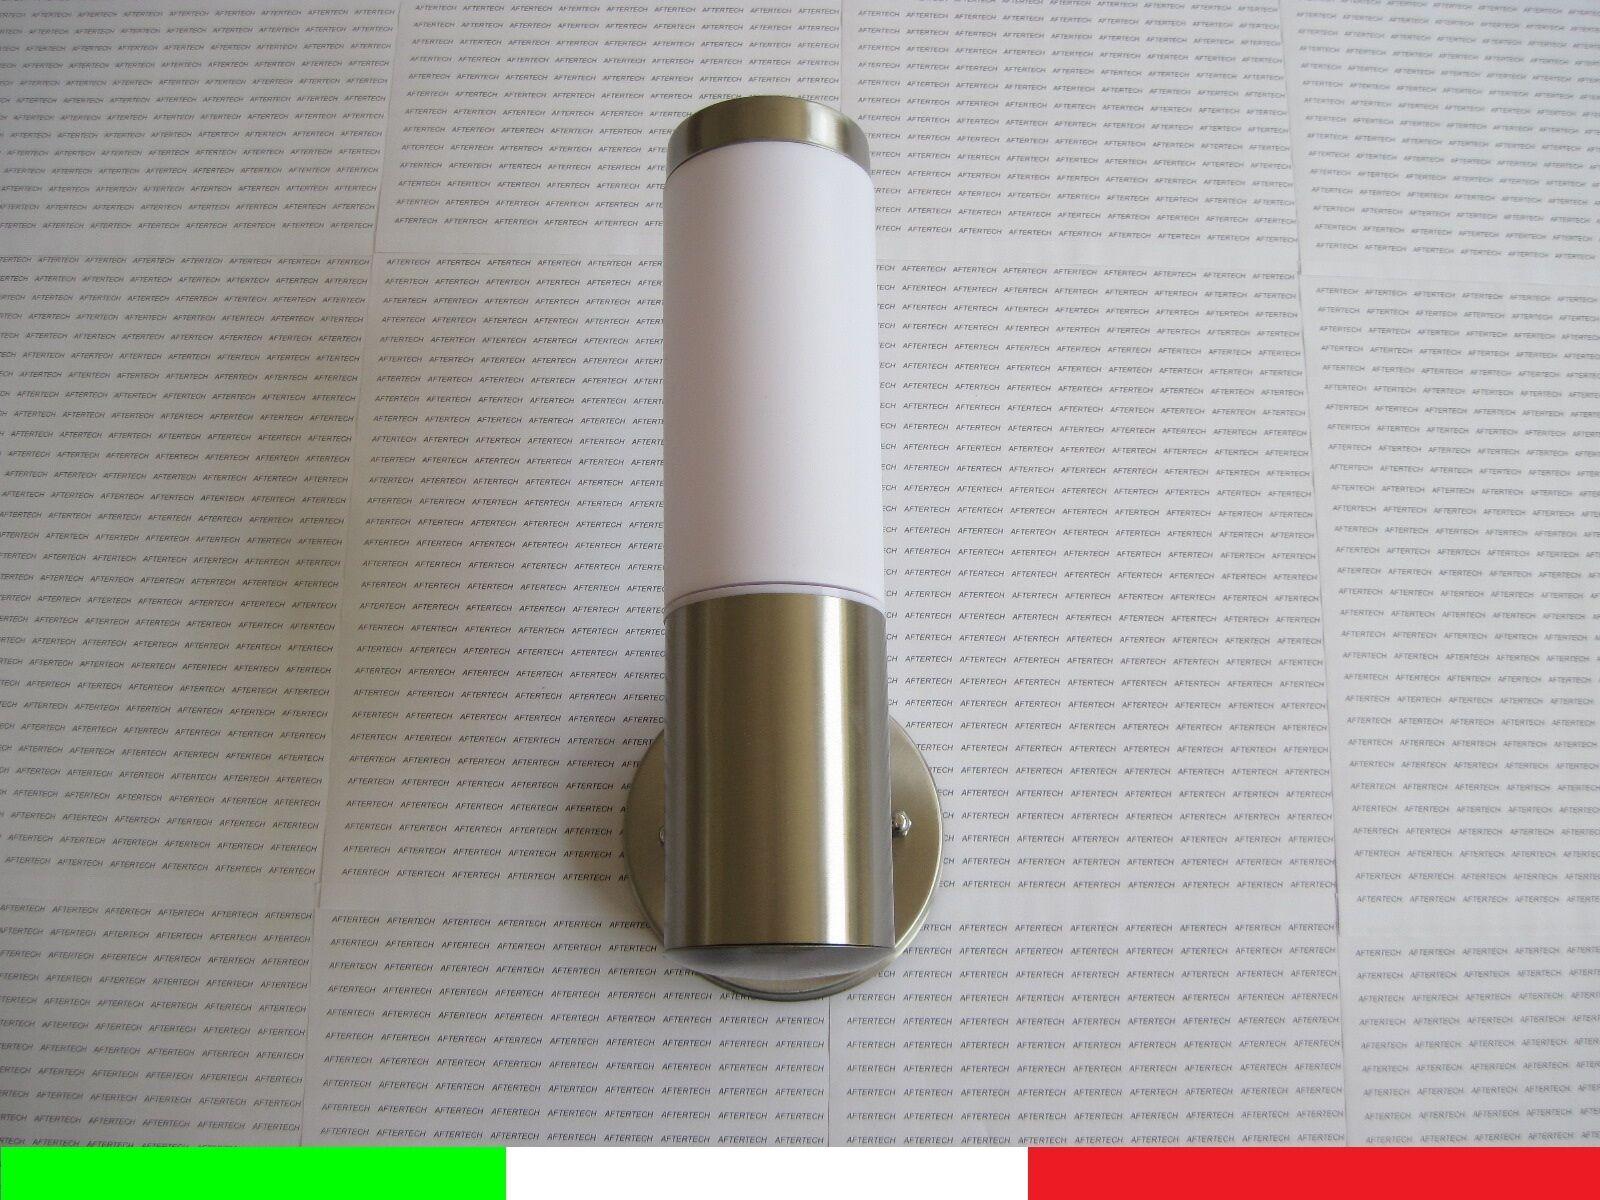 Applique lampada da parete per esterni in acciaio impermeabile